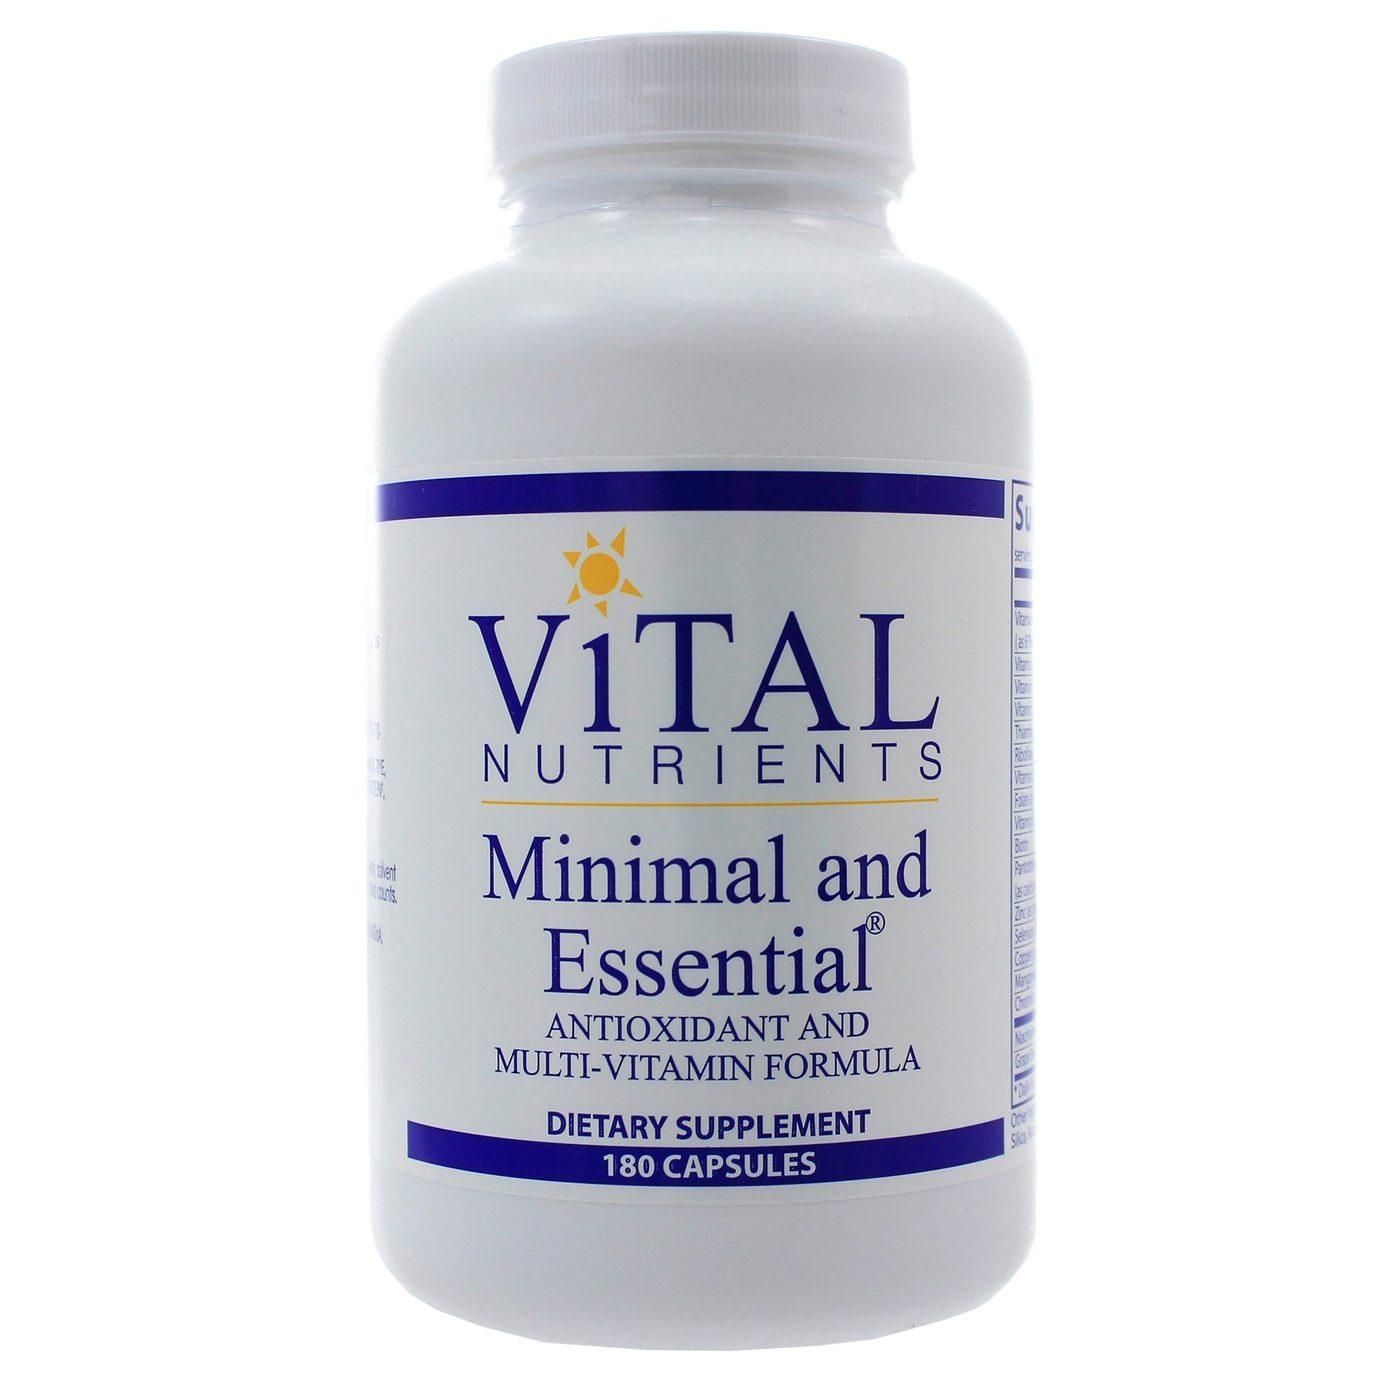 Vital Nutrients Minimal And Essential 180 Capsules